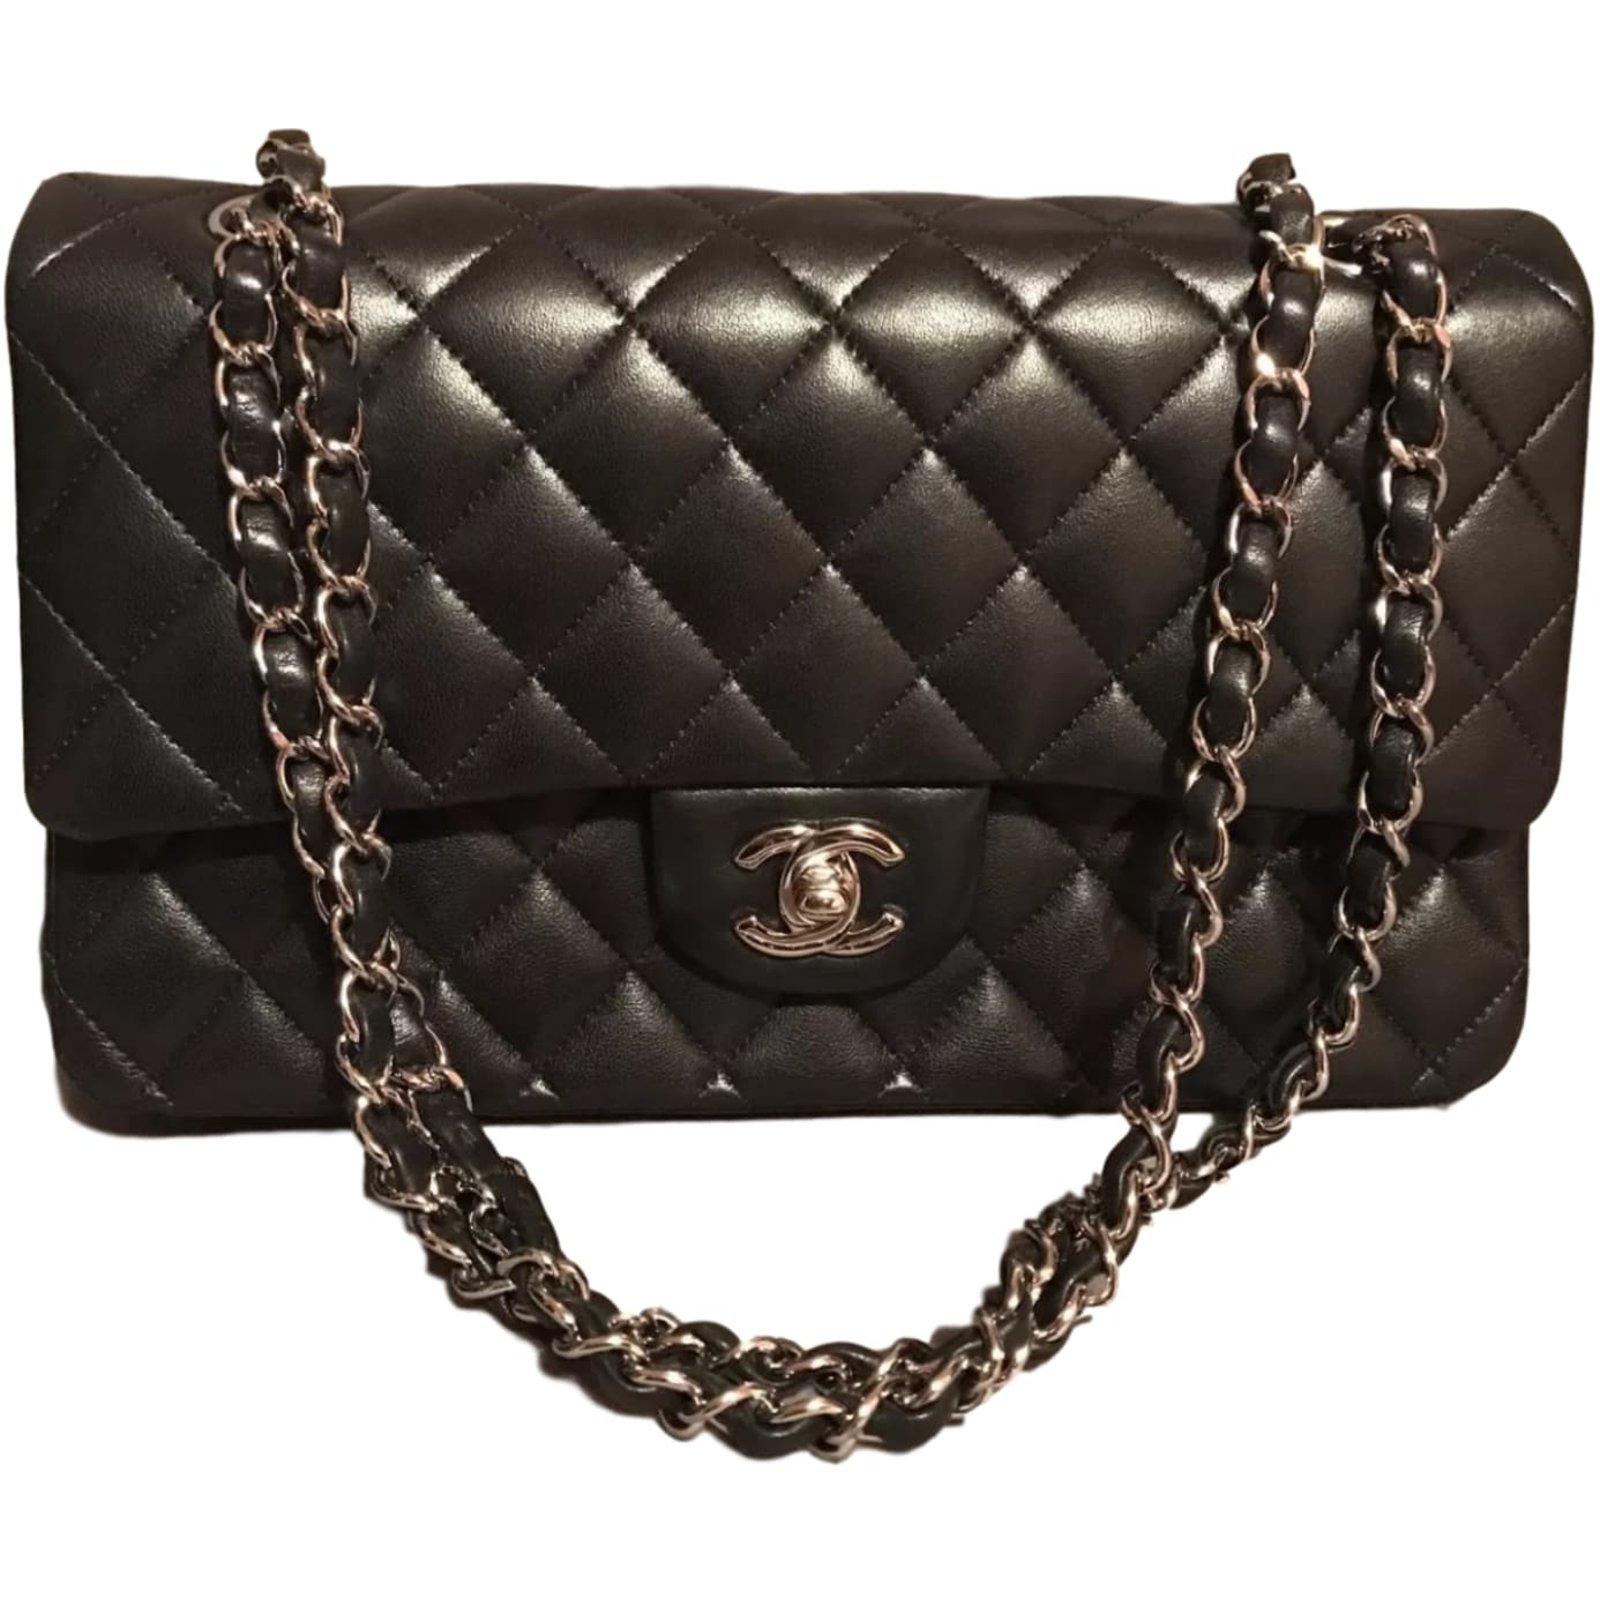 02744b42d11a Sacs à main Chanel Sac Chanel Timeless Cuir Noir ref.40442 - Joli Closet